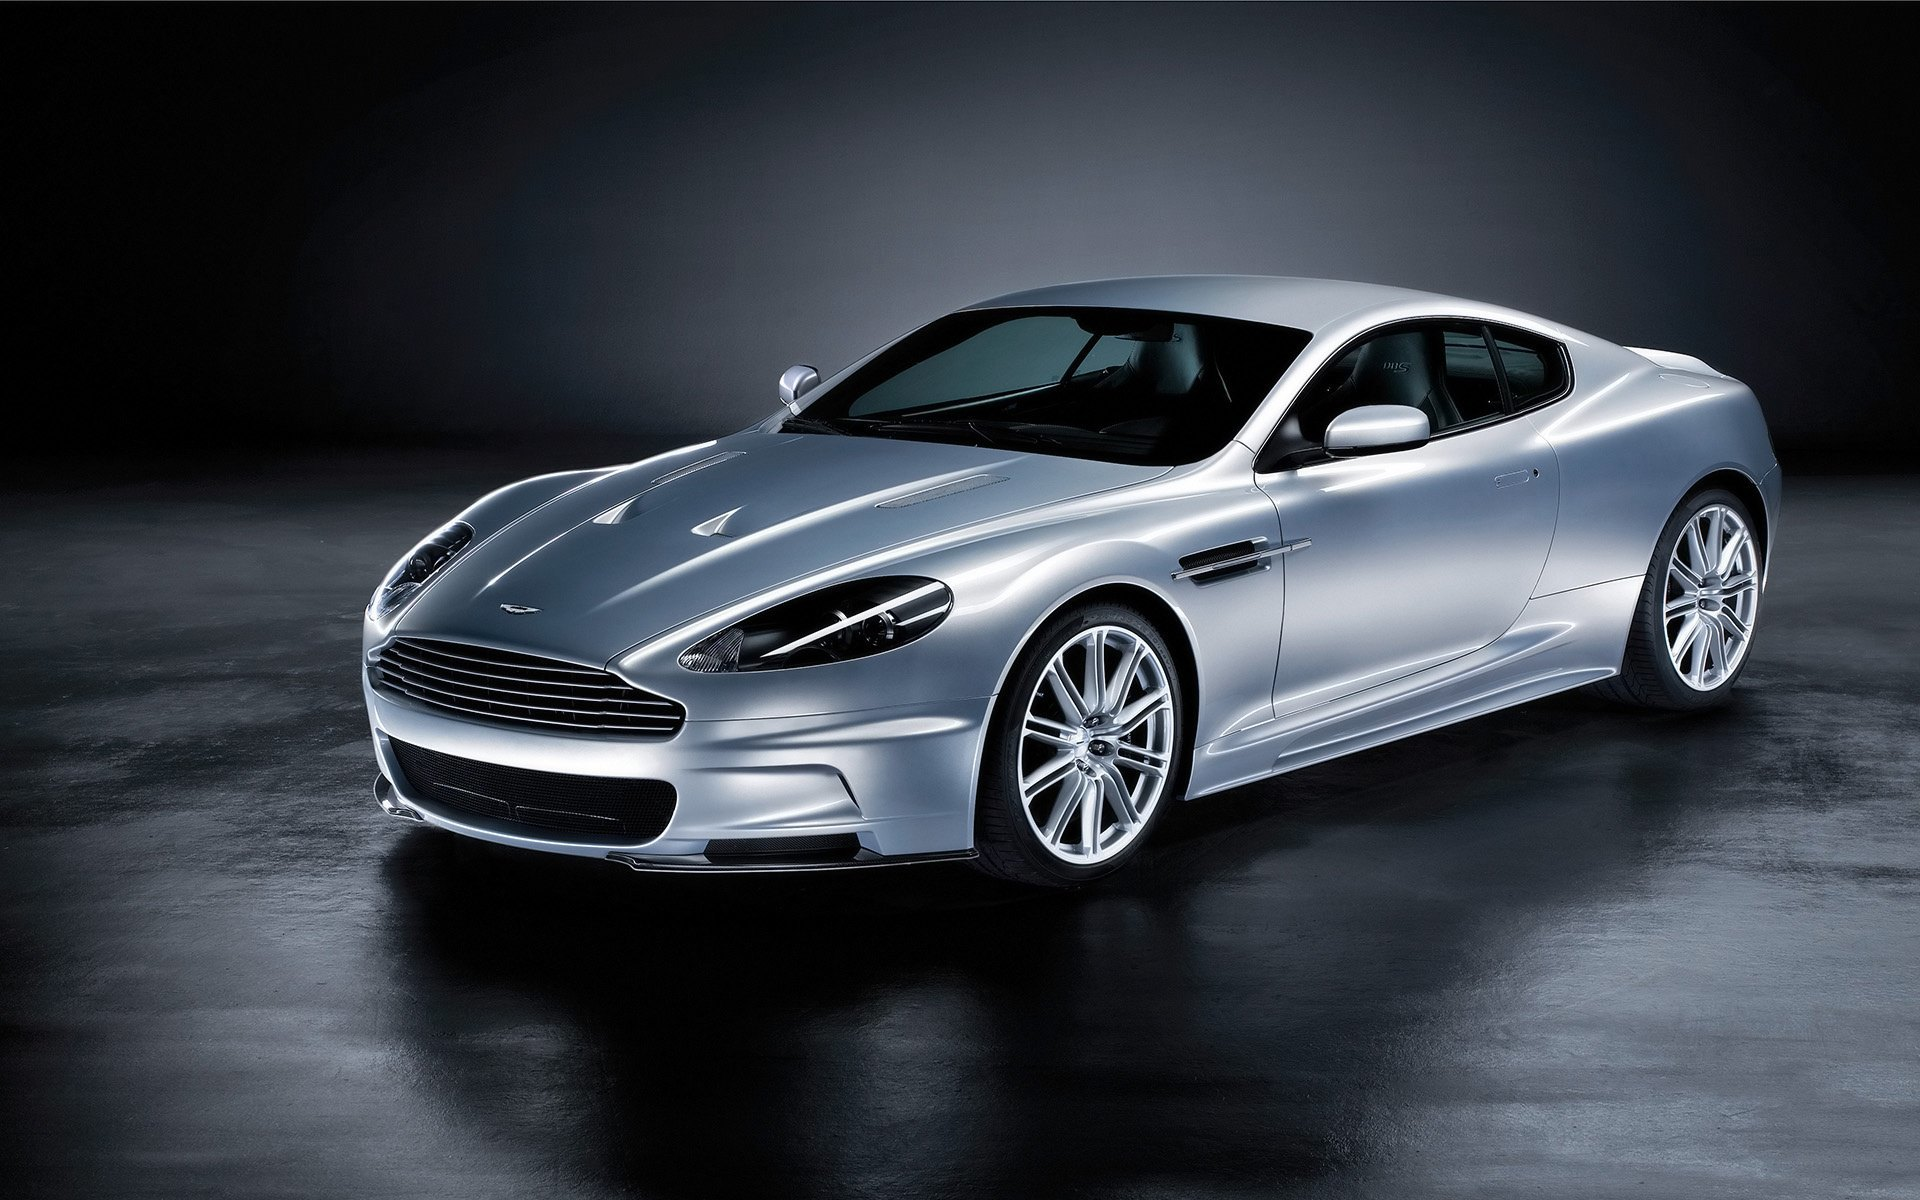 Aston Martin Cars 13 High Resolution Wallpaper